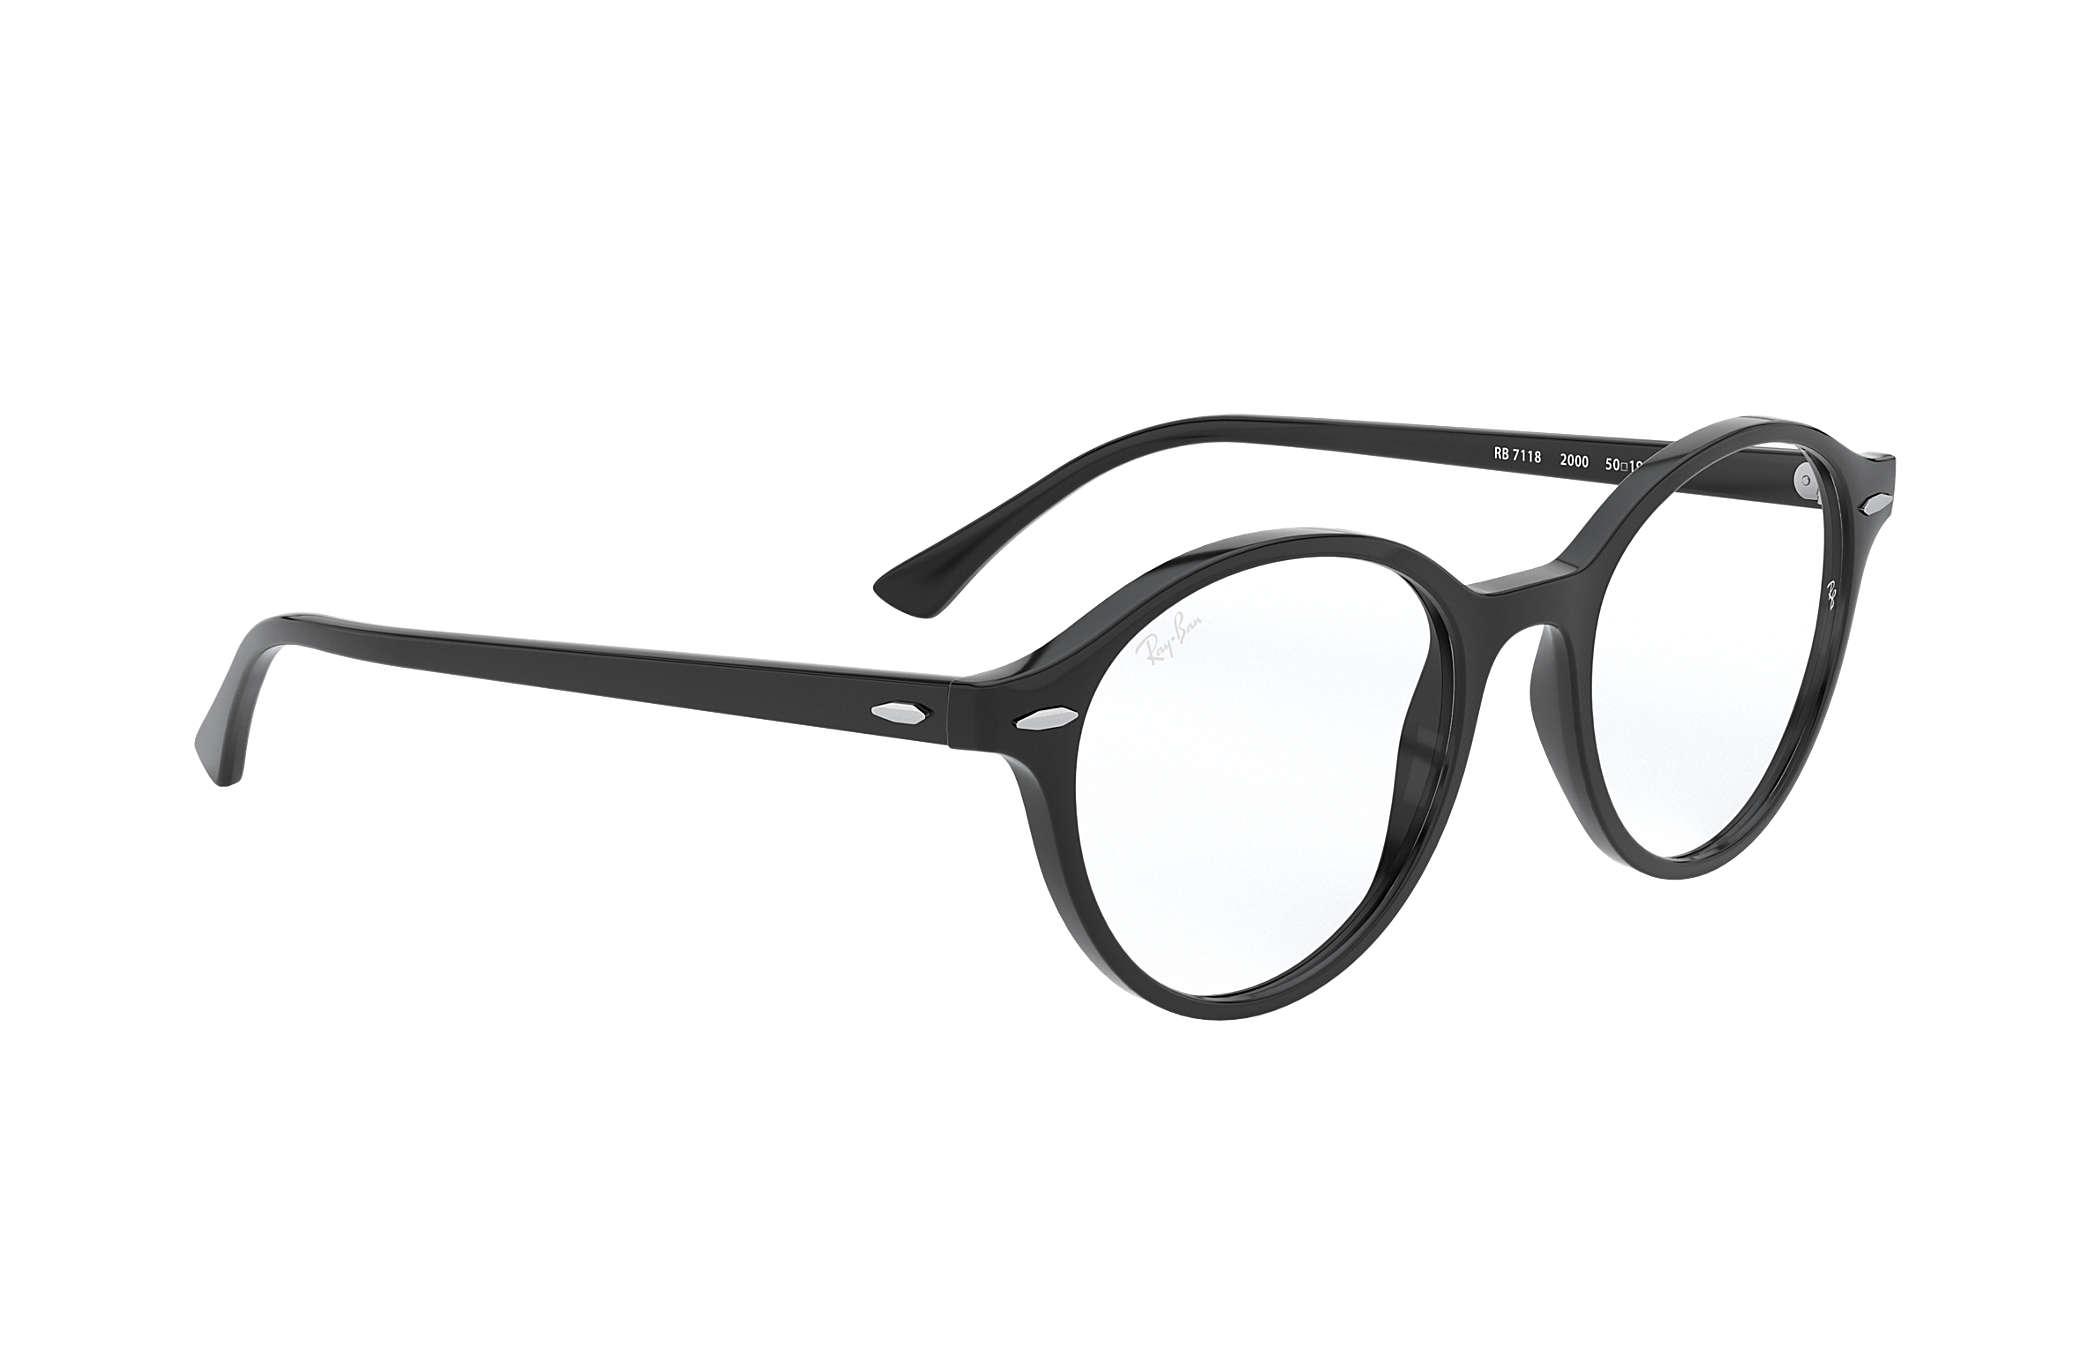 76dc0809824 Ray-Ban eyeglasses Dean RB7118 Black - Propionate - 0RX7118200050 ...